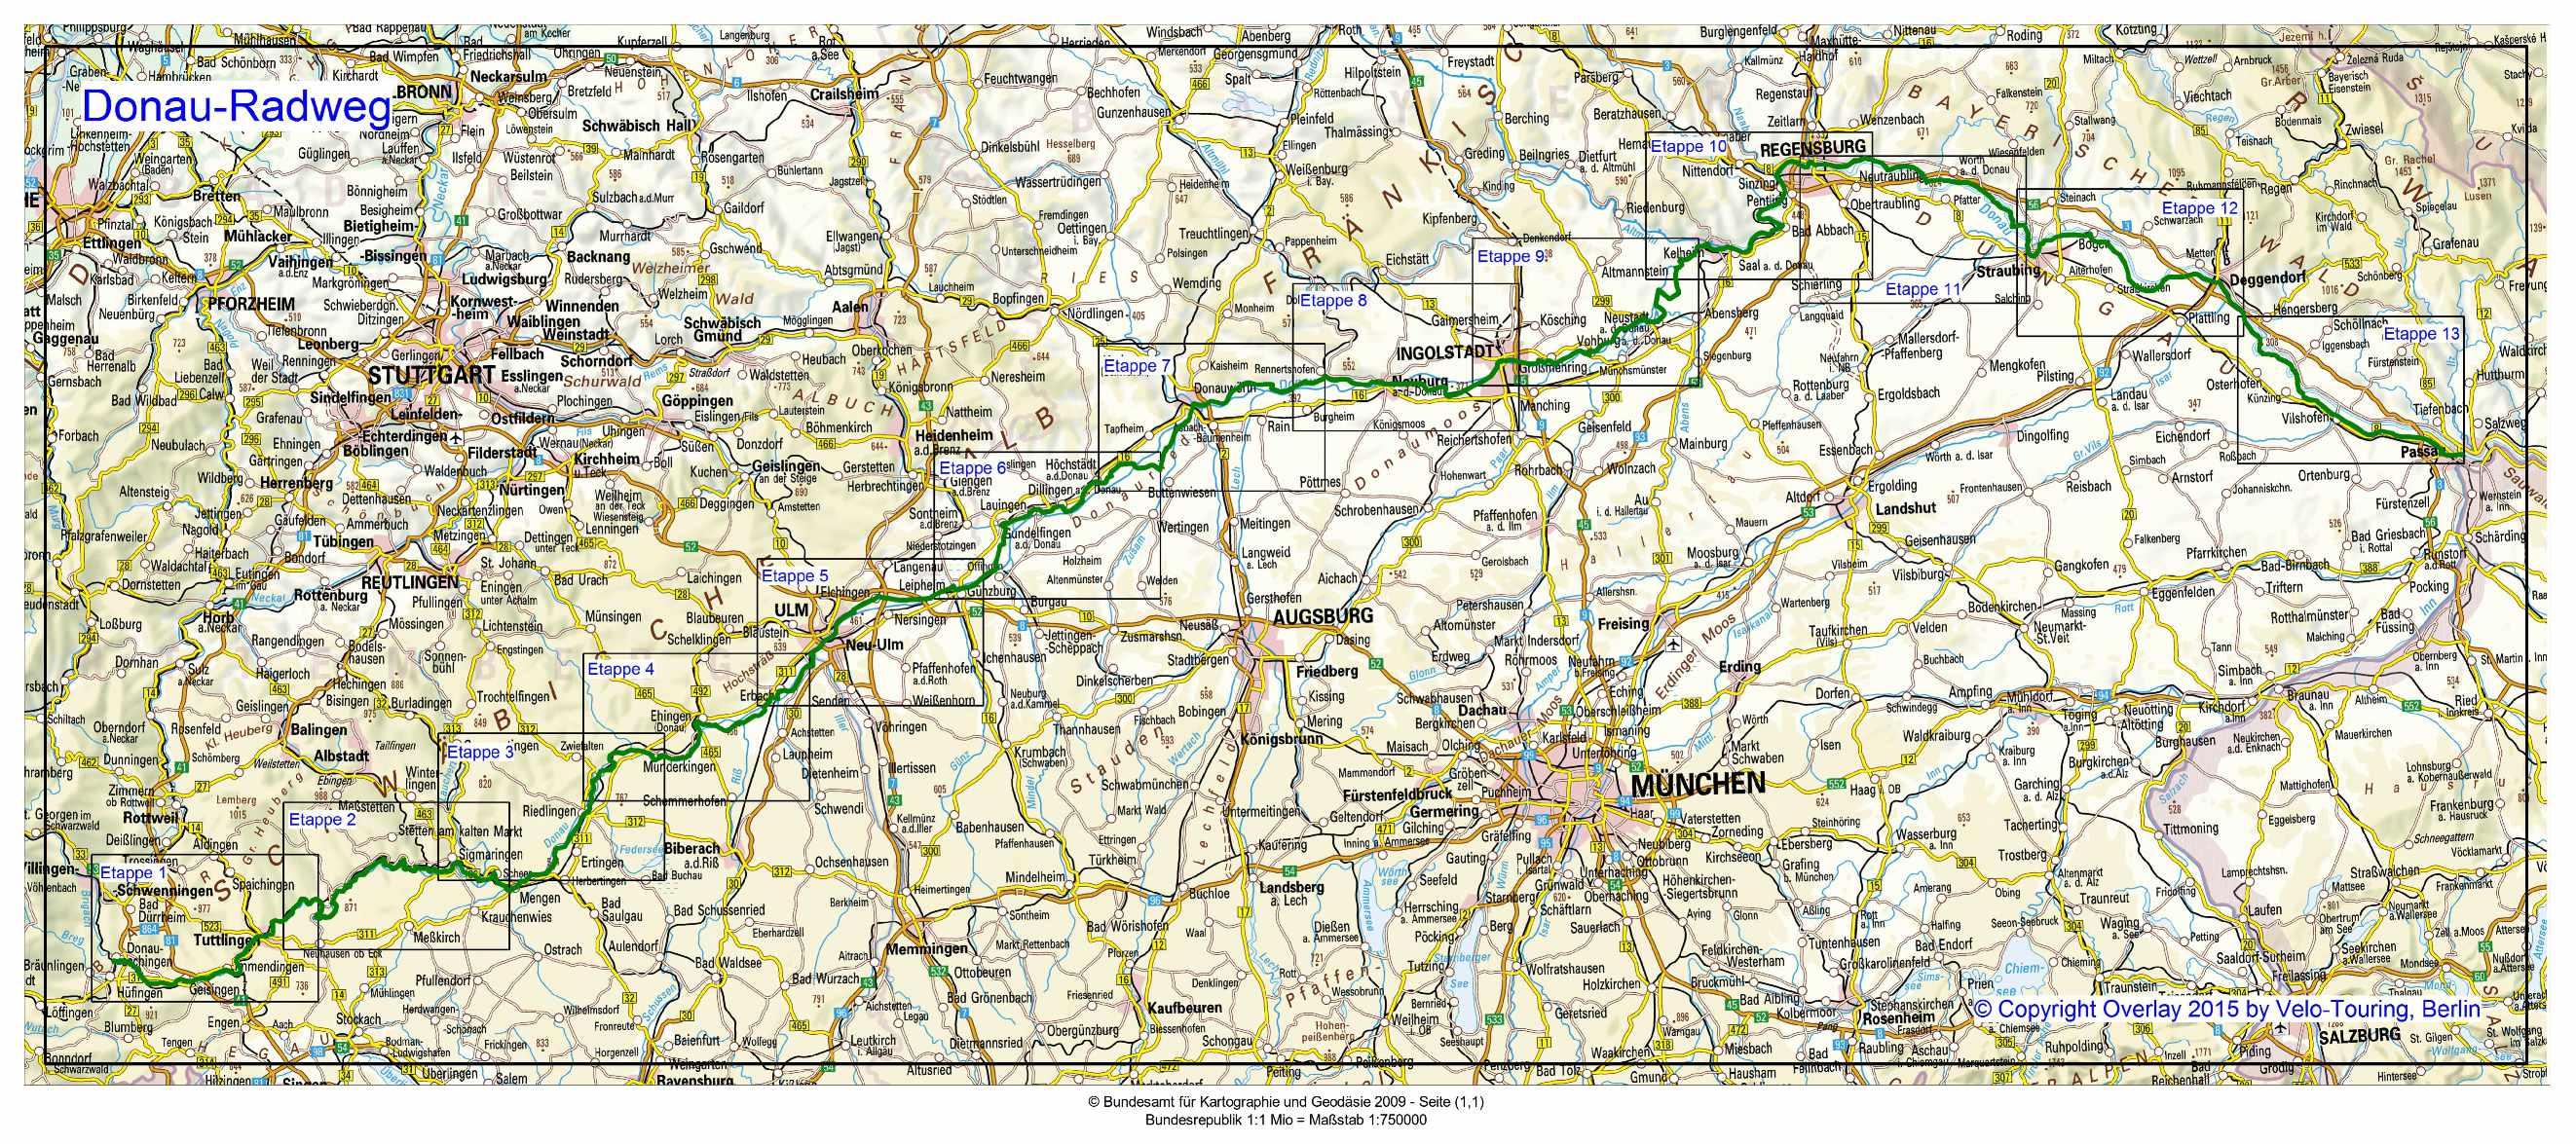 donauradweg karte Velo Touring   Reiseführer :: Donau Radweg von Donaueschingen nach